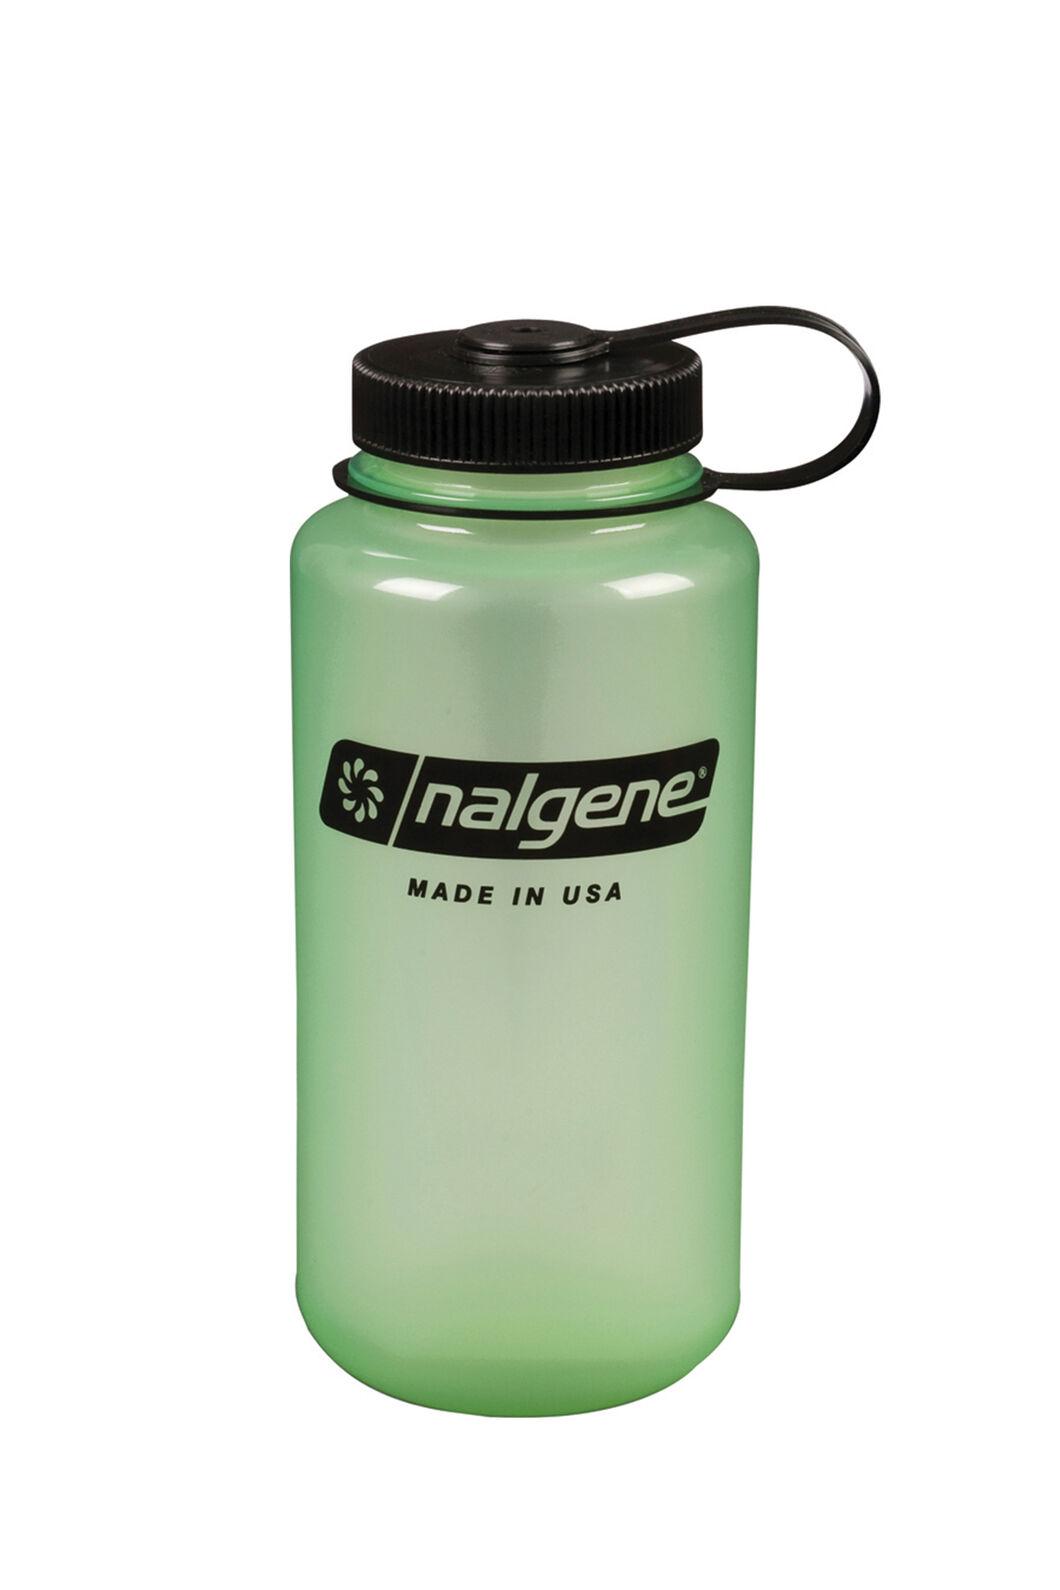 Nalgene Wide Mouth Glow in the Dark Drink Bottle 1L, None, hi-res